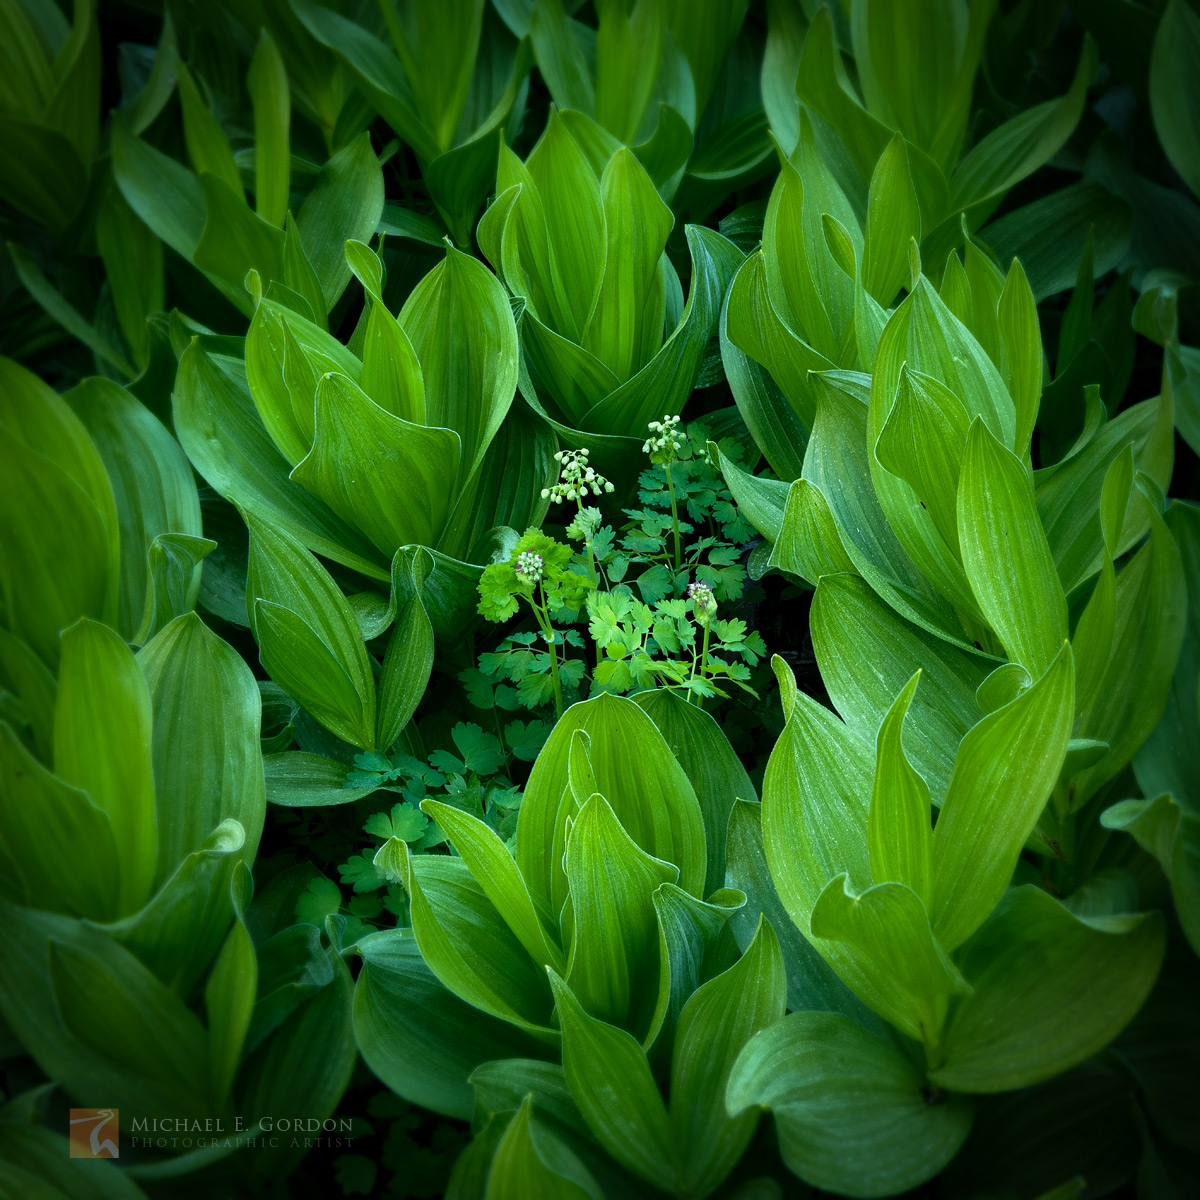 Fendler's Meadow Rue (Thalictrum fendleri) in the sheltered embrace of California Corn Lily (Veratrum californicum).